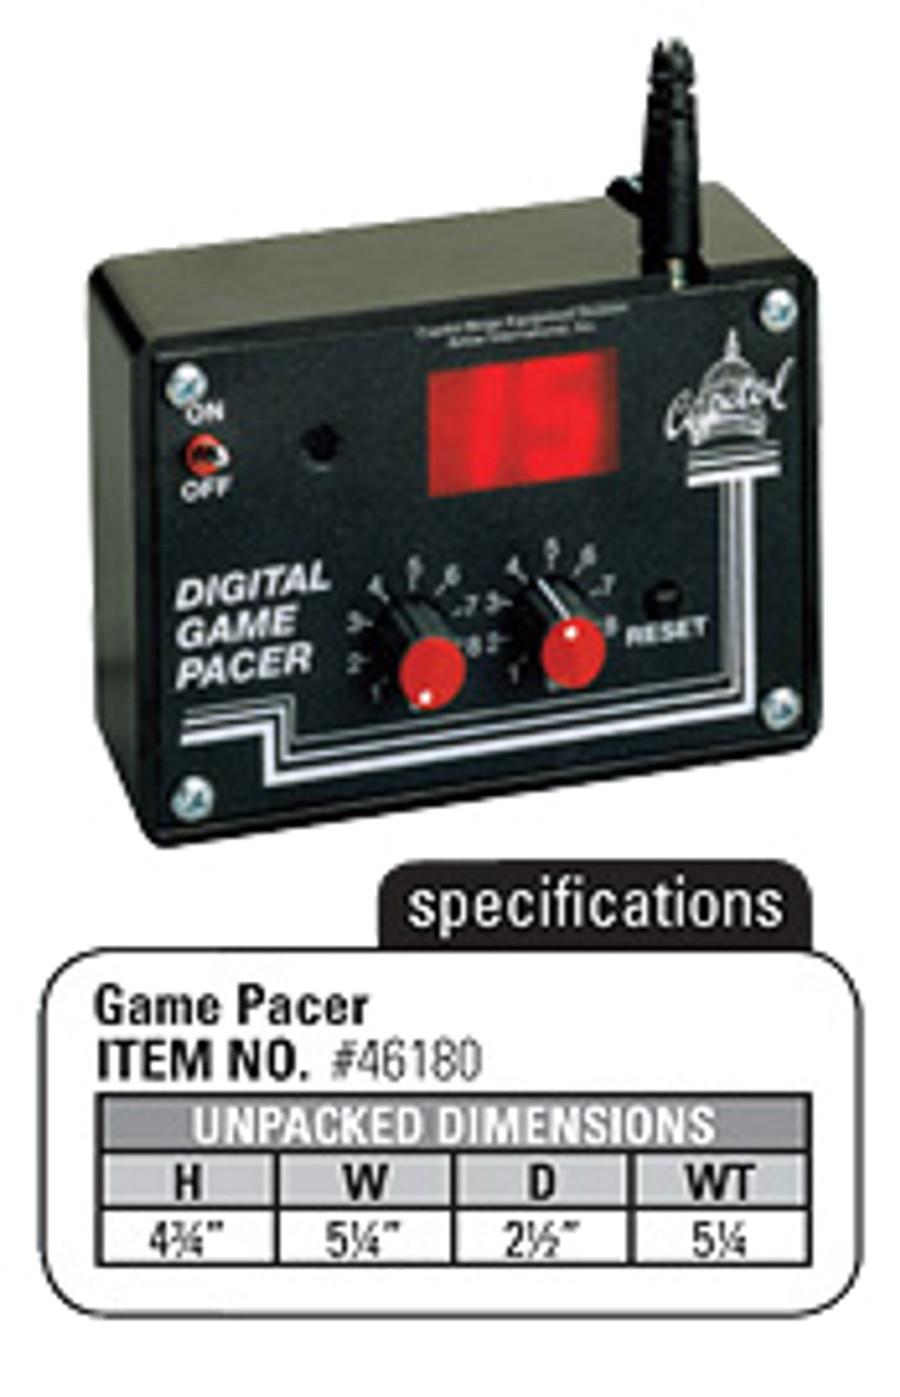 Digital Game Pacer